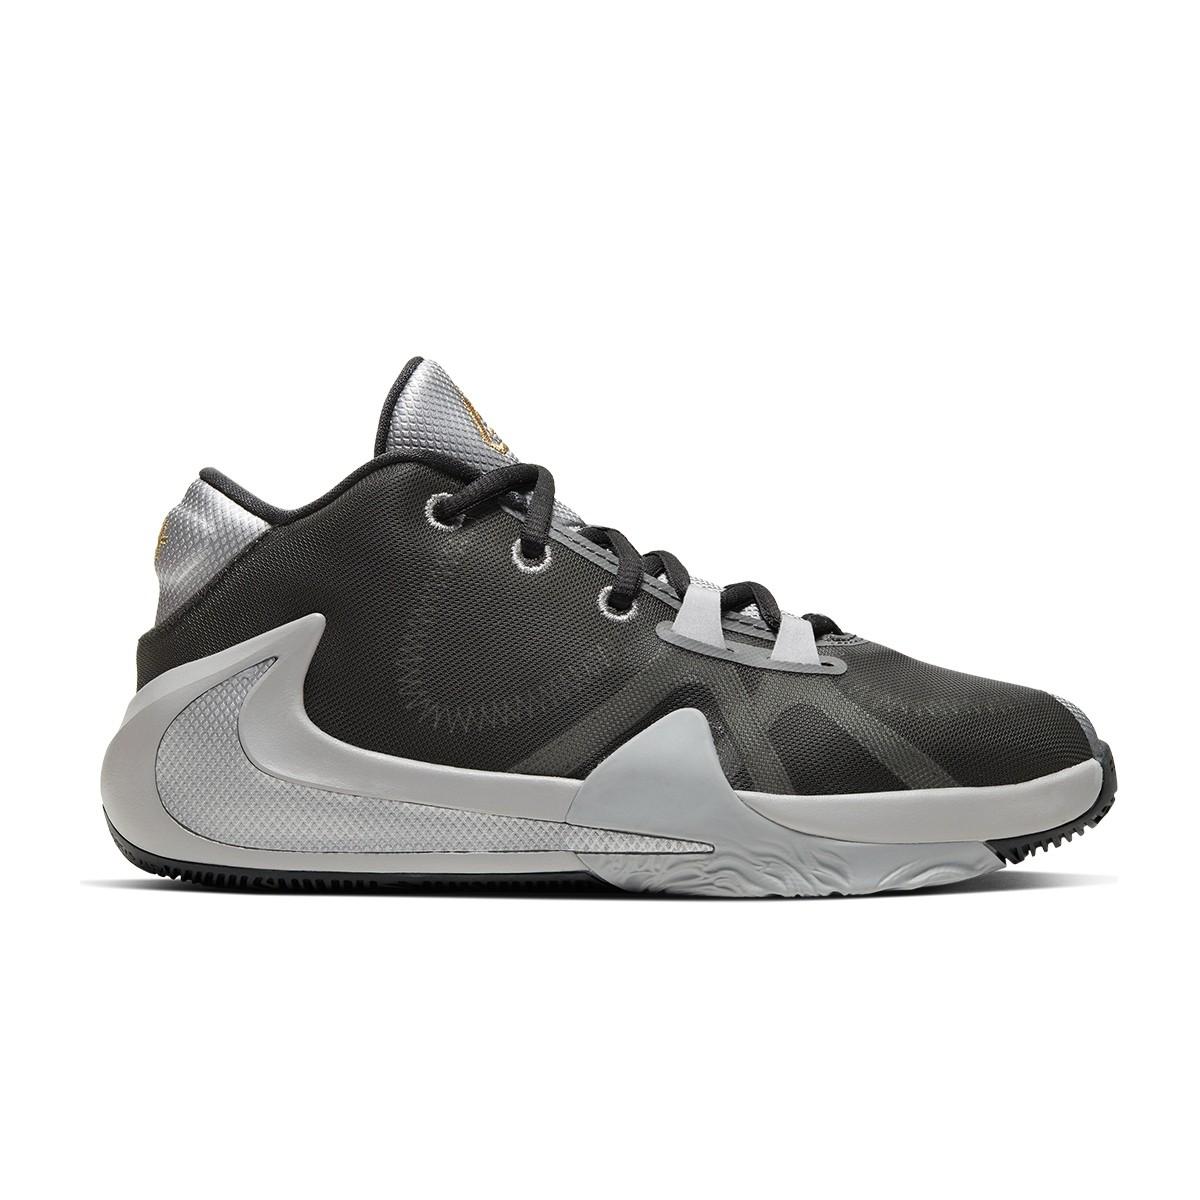 Nike Freak GS 'Smoke Grey'